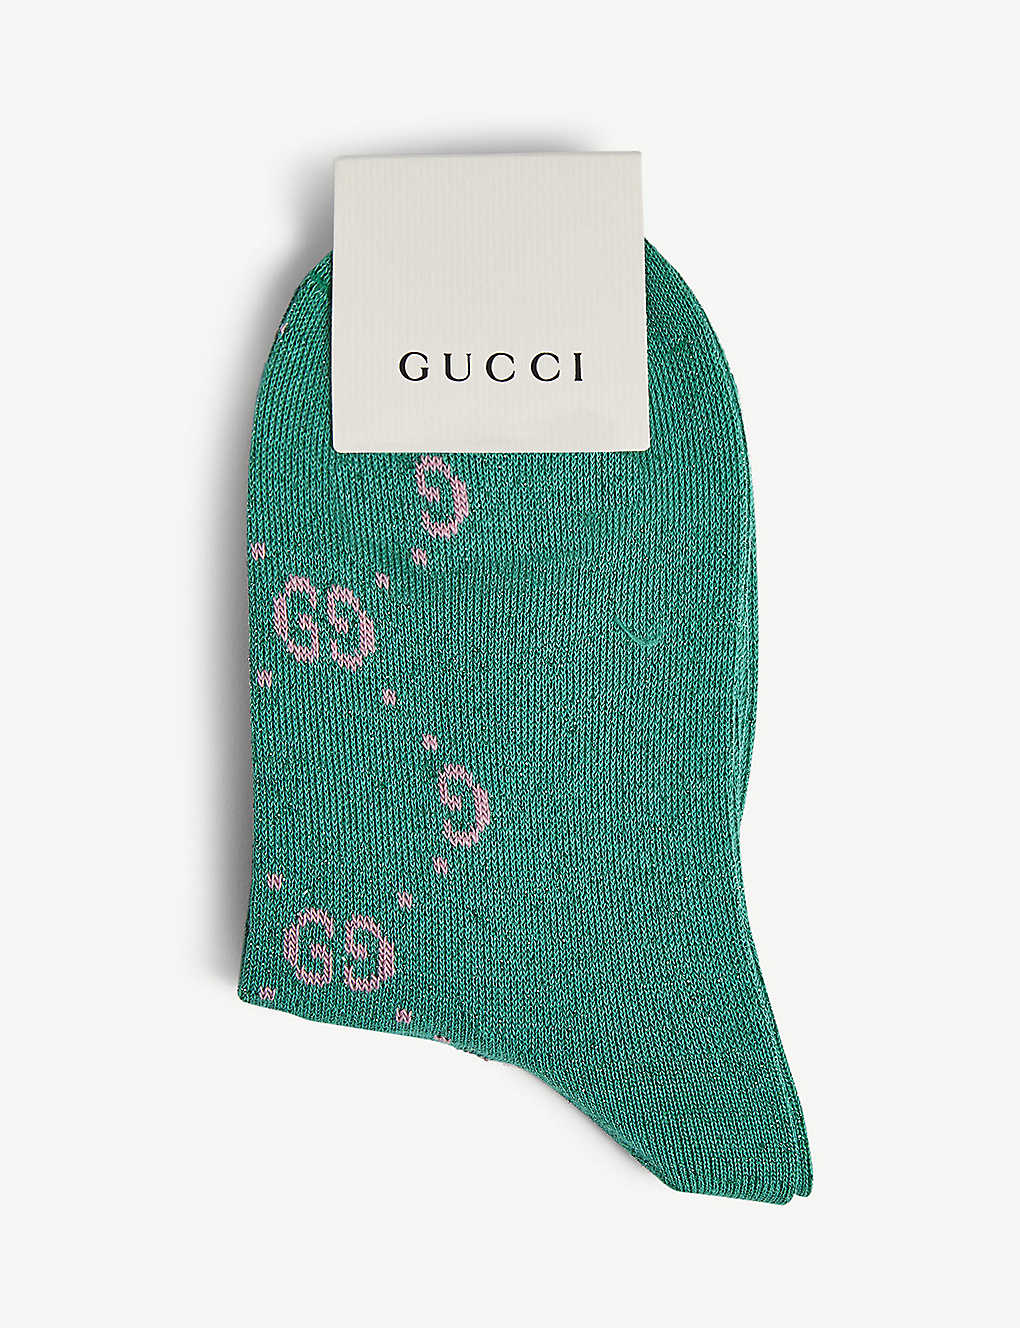 ccdd1cfd6 GUCCI - GG Lurex socks 8-12 years | Selfridges.com